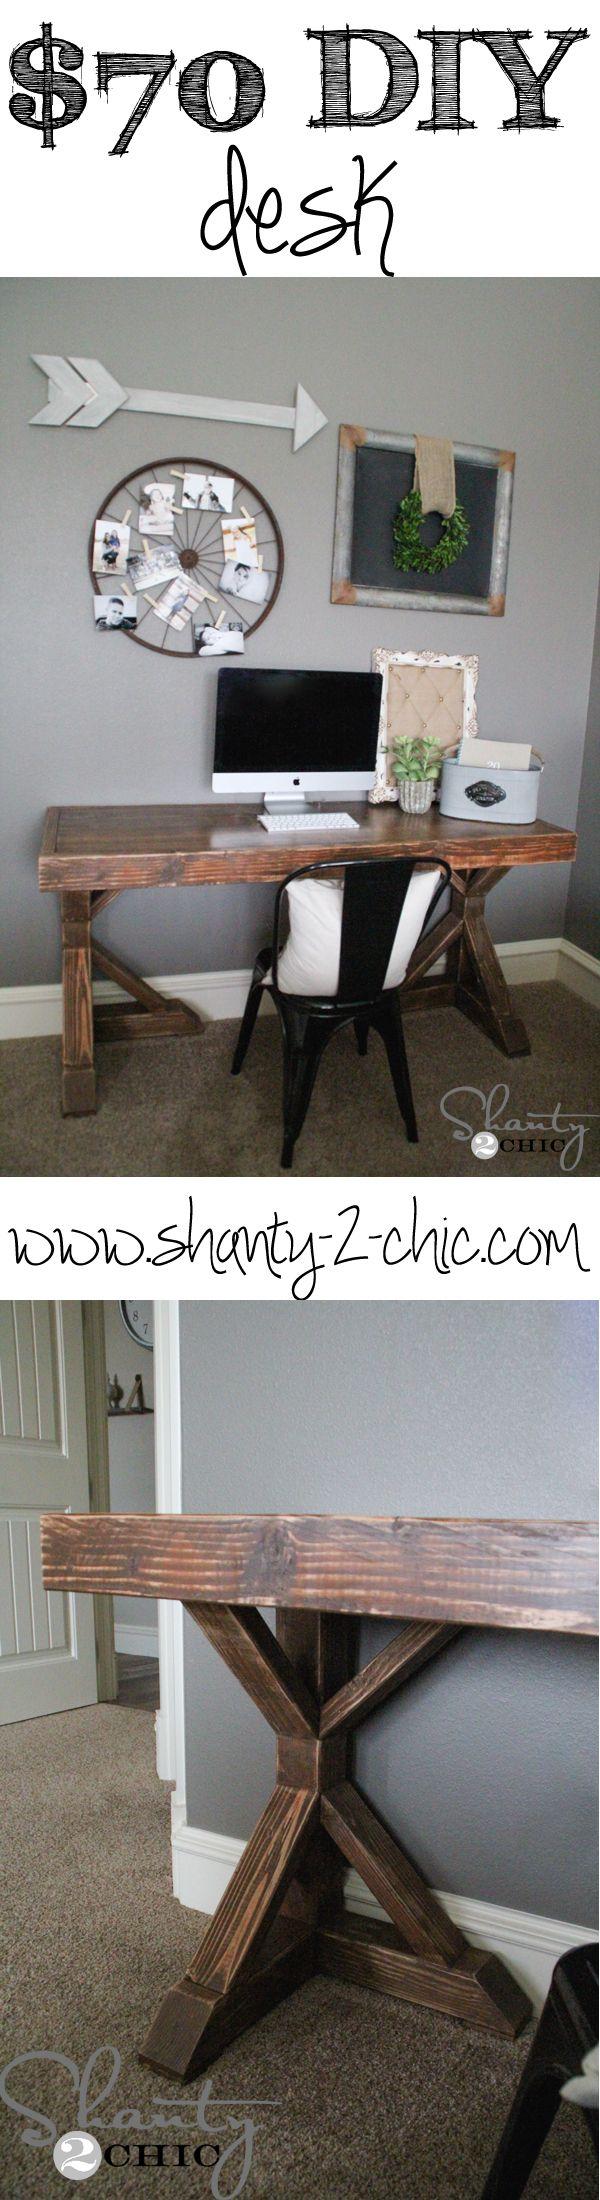 Best 25+ Diy office desk ideas on Pinterest